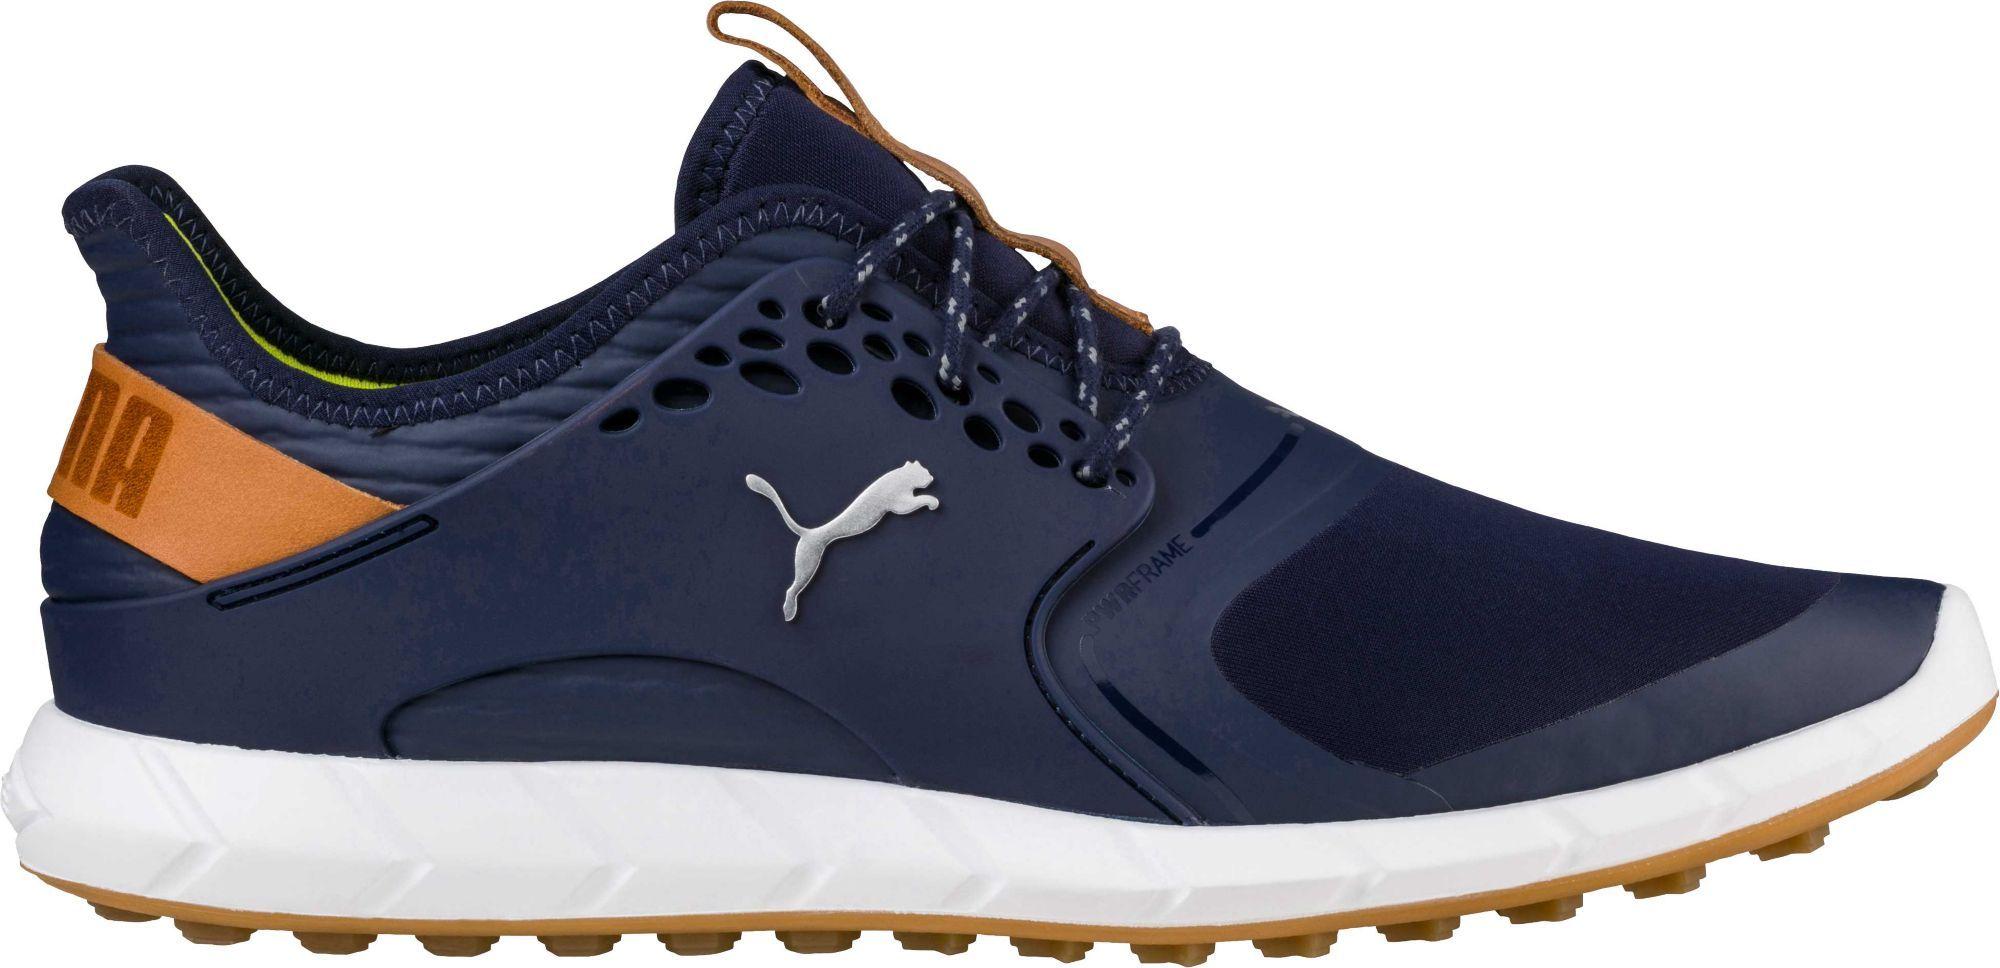 Puma Ignite Pwrsport Golf Shoes, Men's, Size: 14.0, Blue